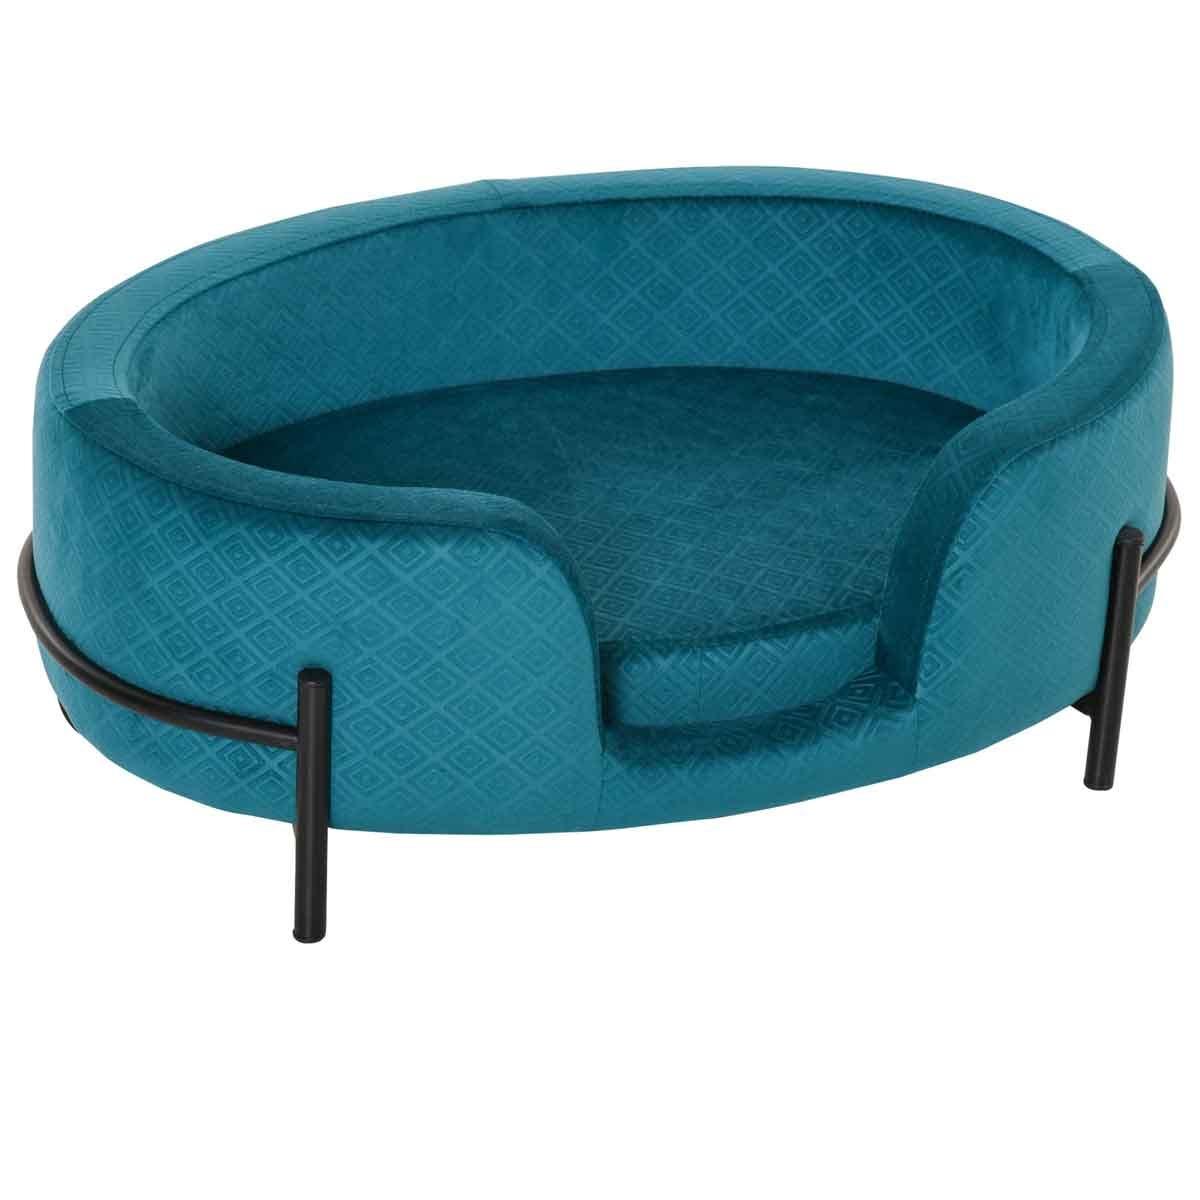 PawHut Pet Sofa W/ Removable Seat Cushion & Solid Metal Base - Teal